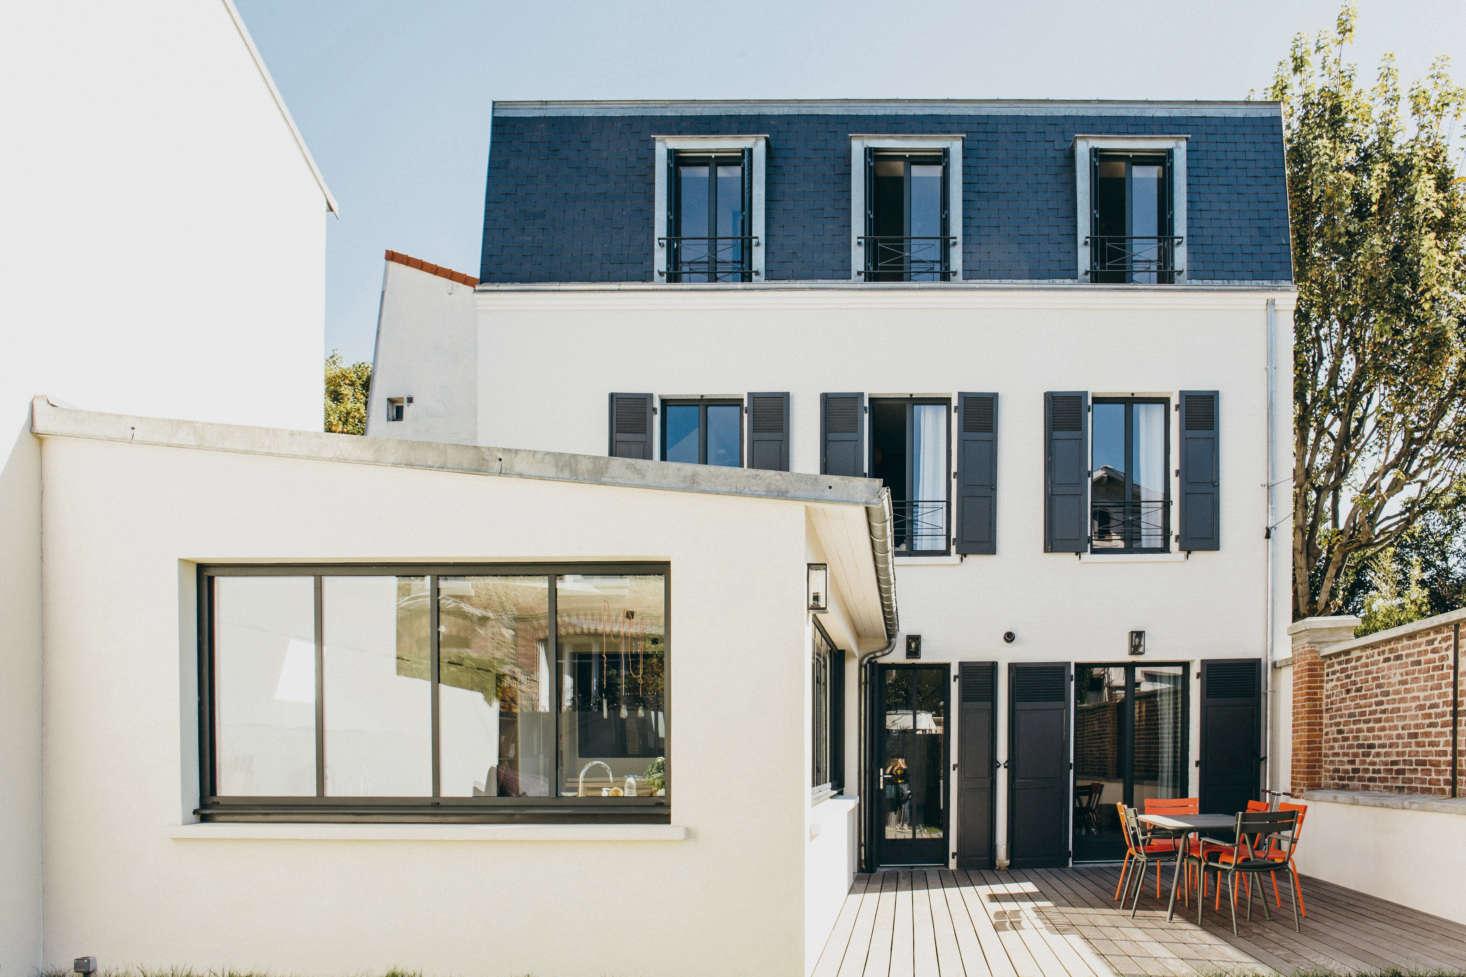 10 Easy Pieces Parisian Designers Exterior Paint Picks Gardenista